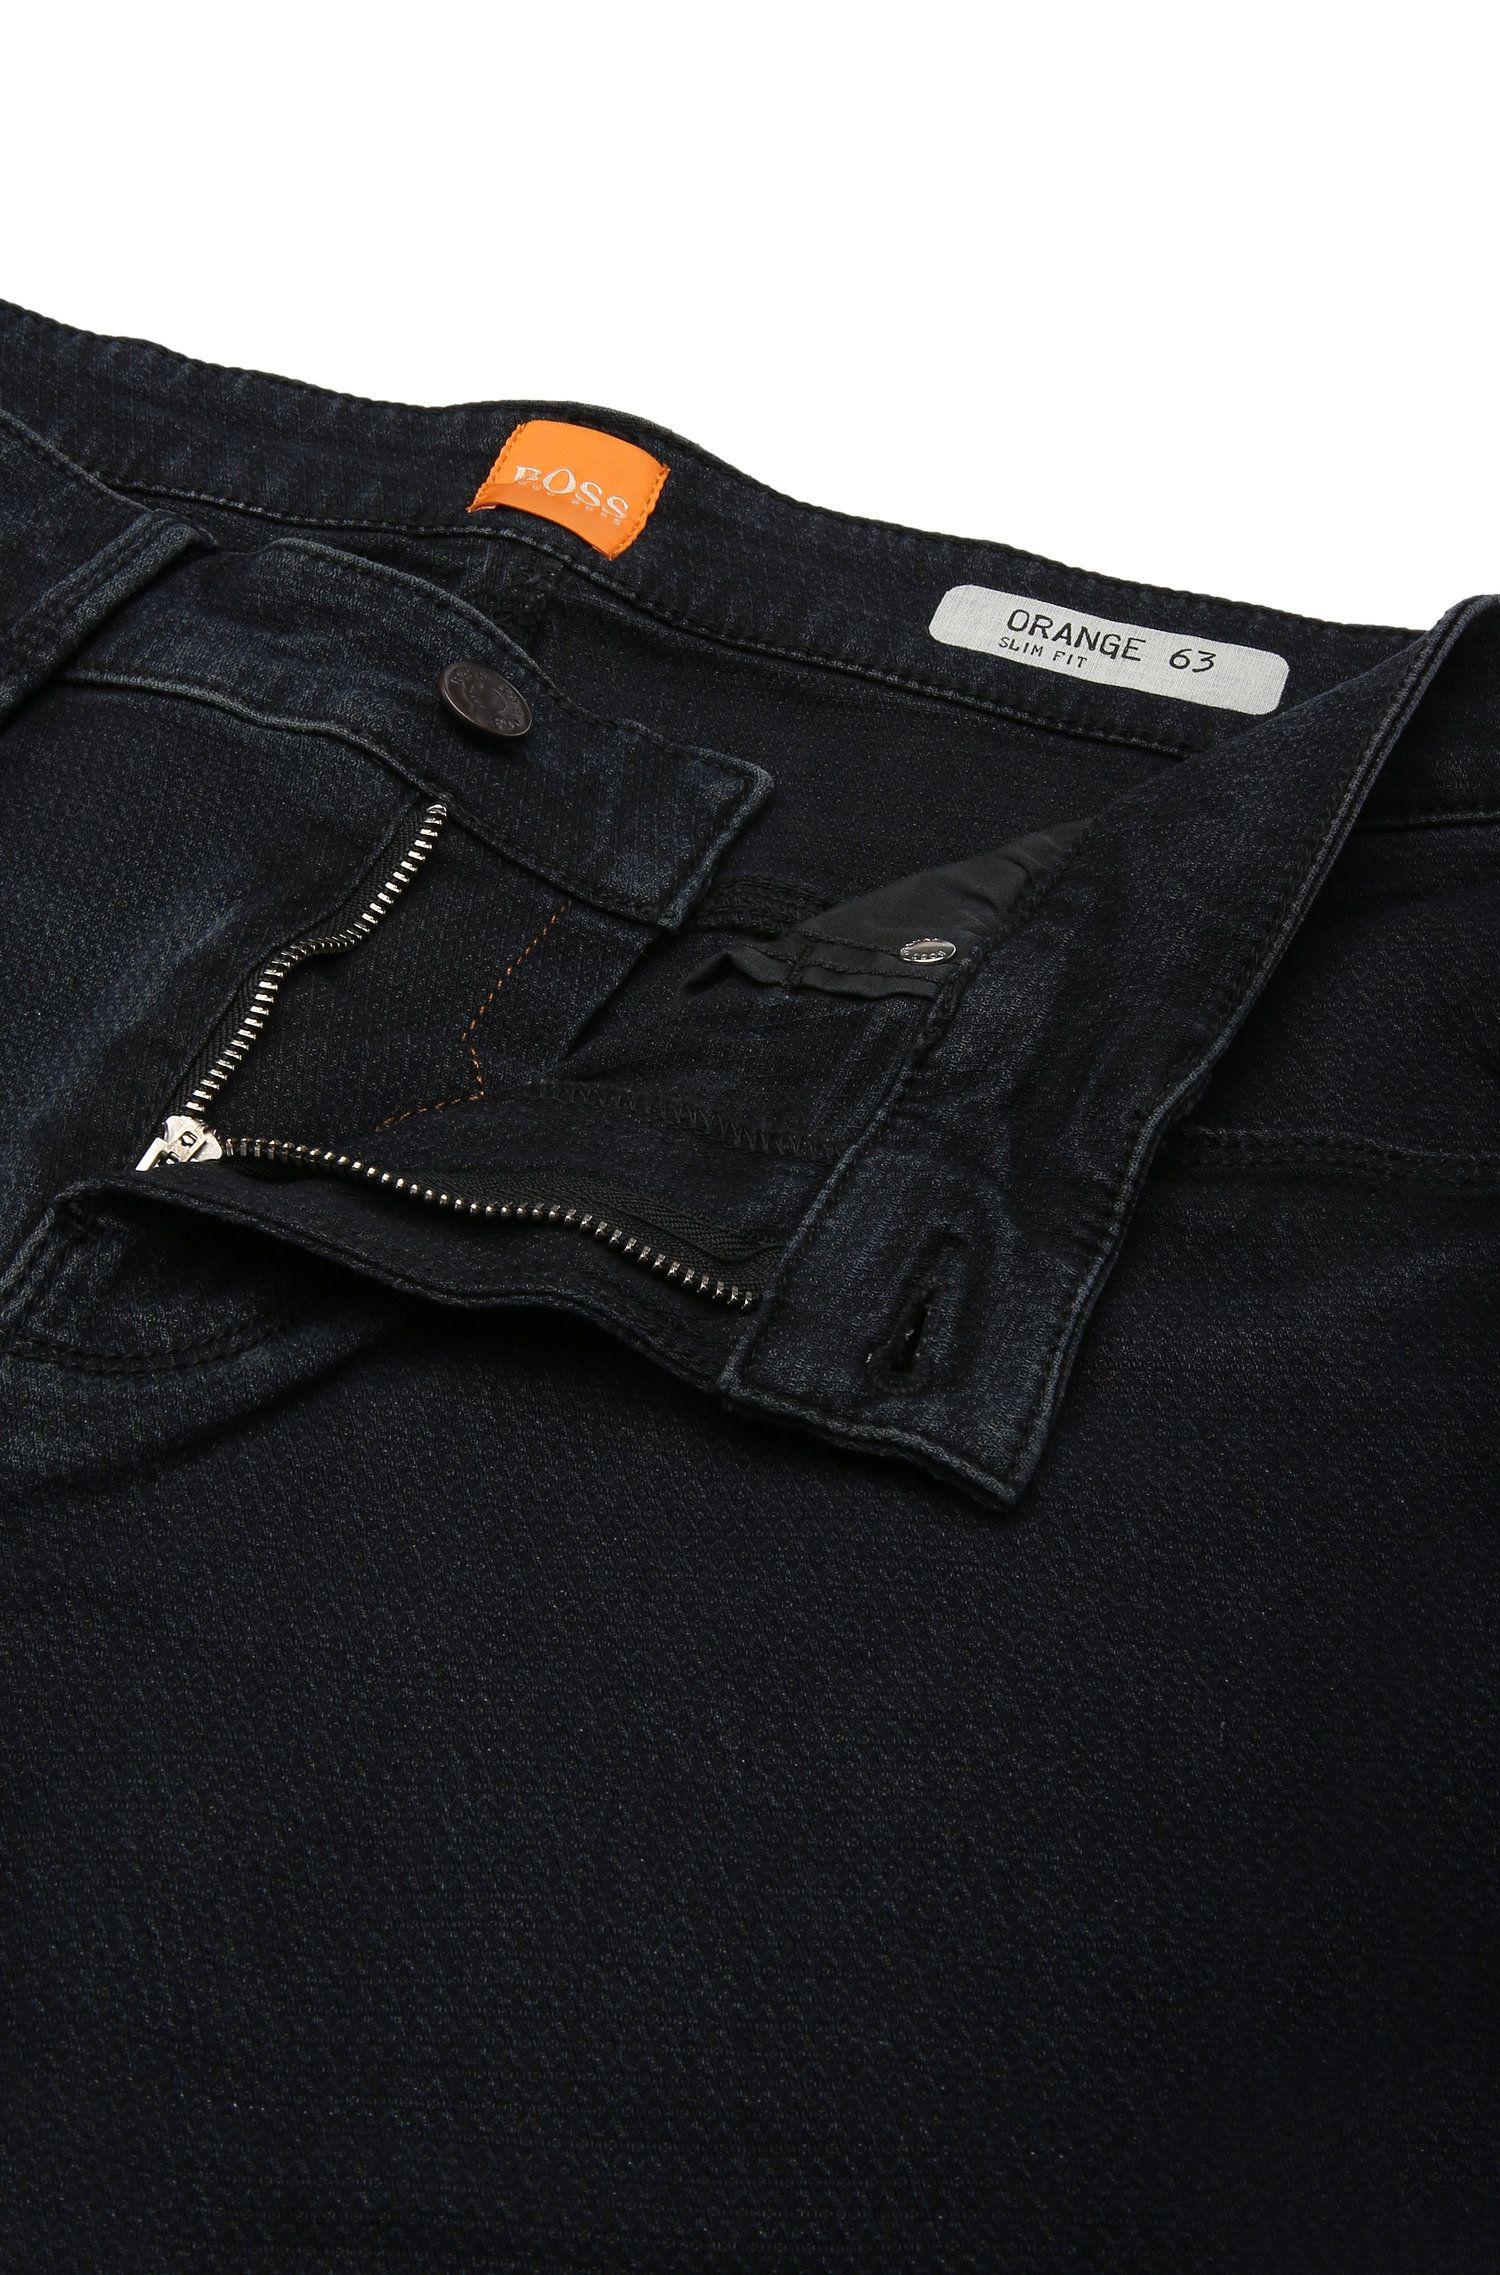 Stretch Cotton Blend Jean, Slim Leg | Orange63